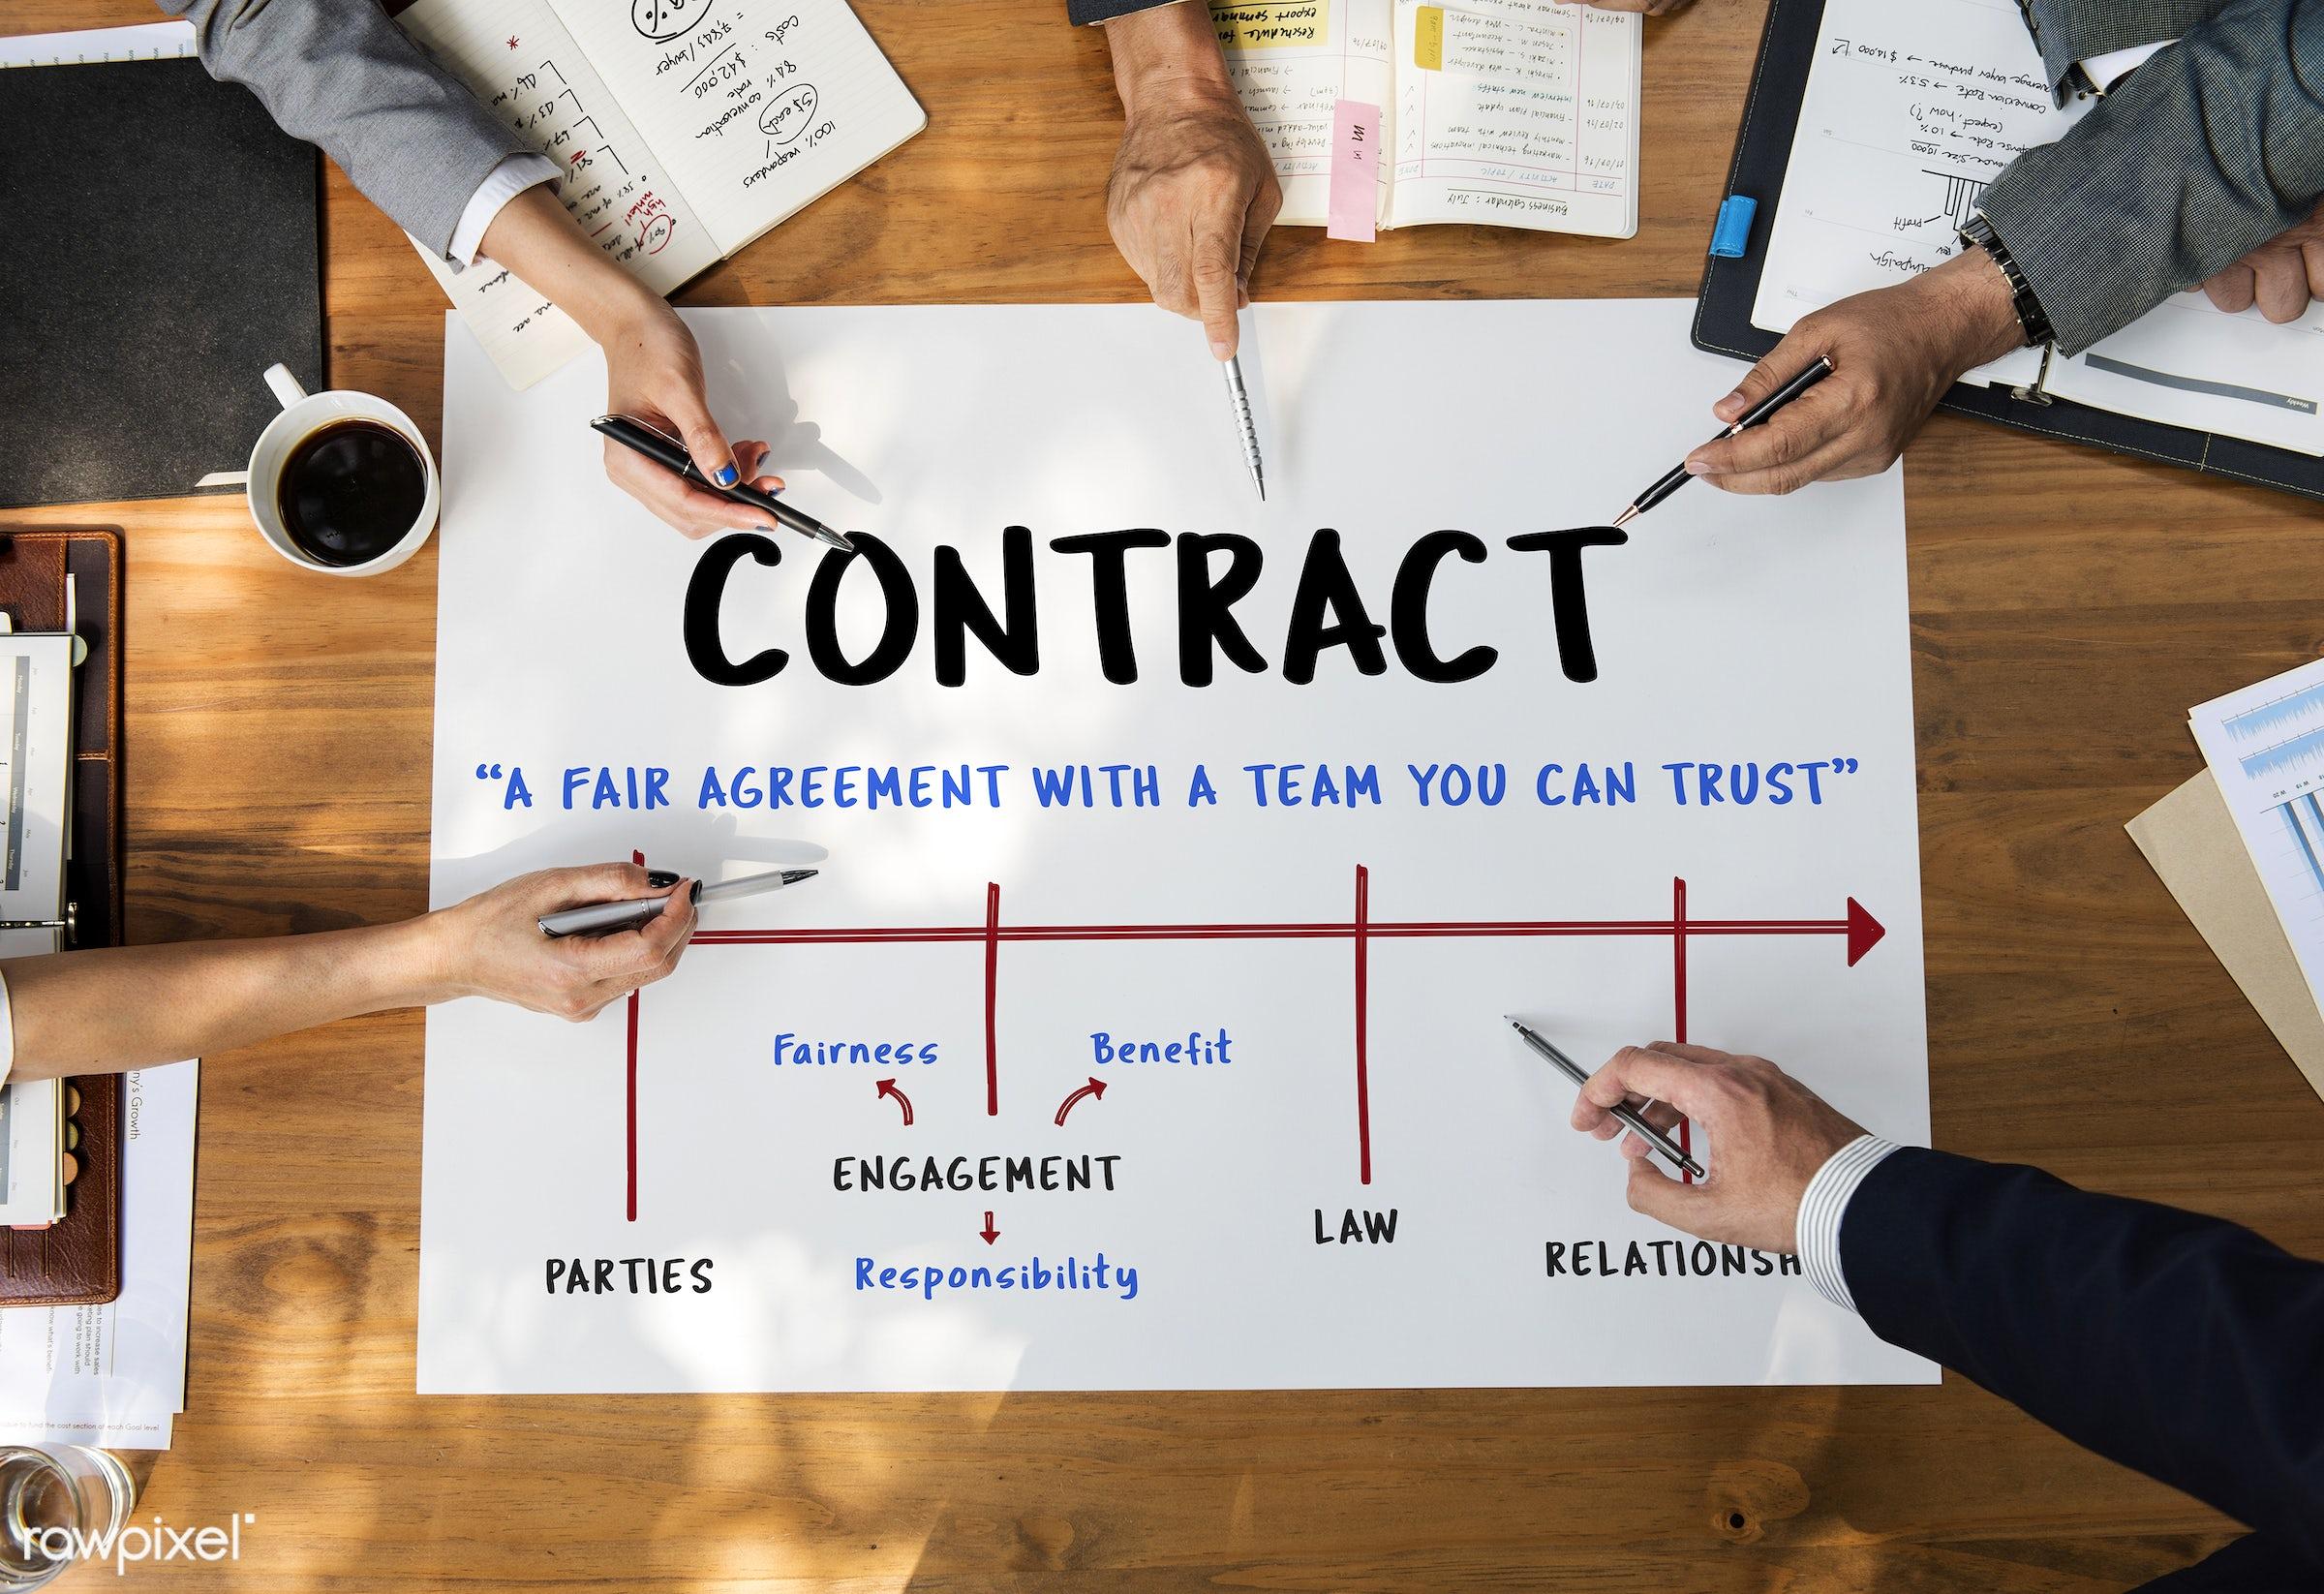 commitment, agreement, asian, binding, bond, brainstorming, business, businessmen, businesswomen, compromise, contract, deal...